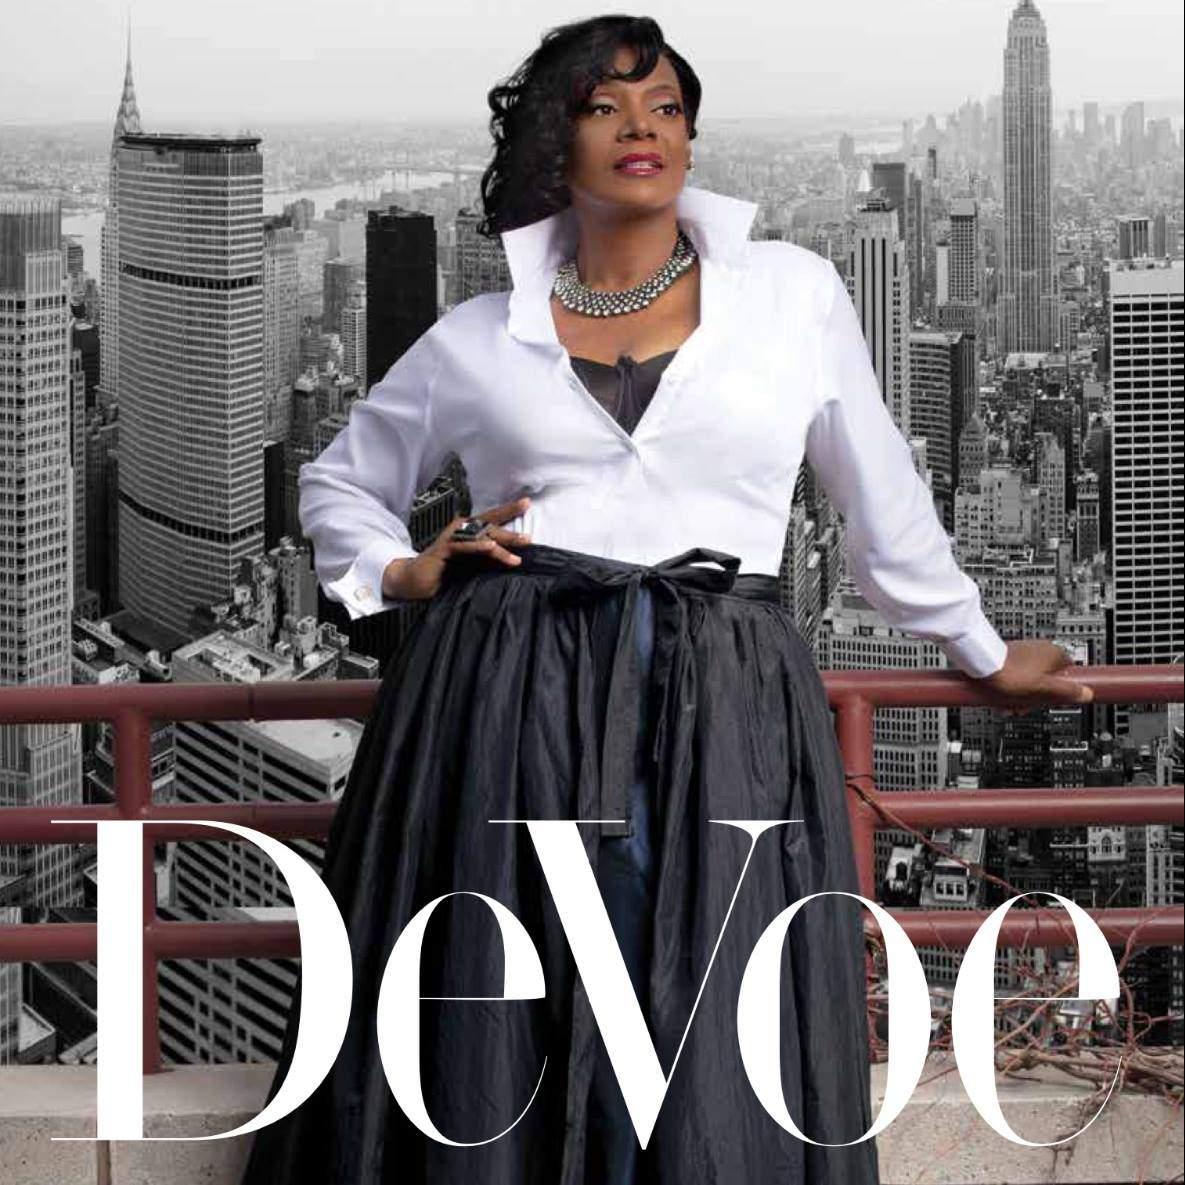 Marie Denee The Curvy Fashionista in DeVoe Magazine